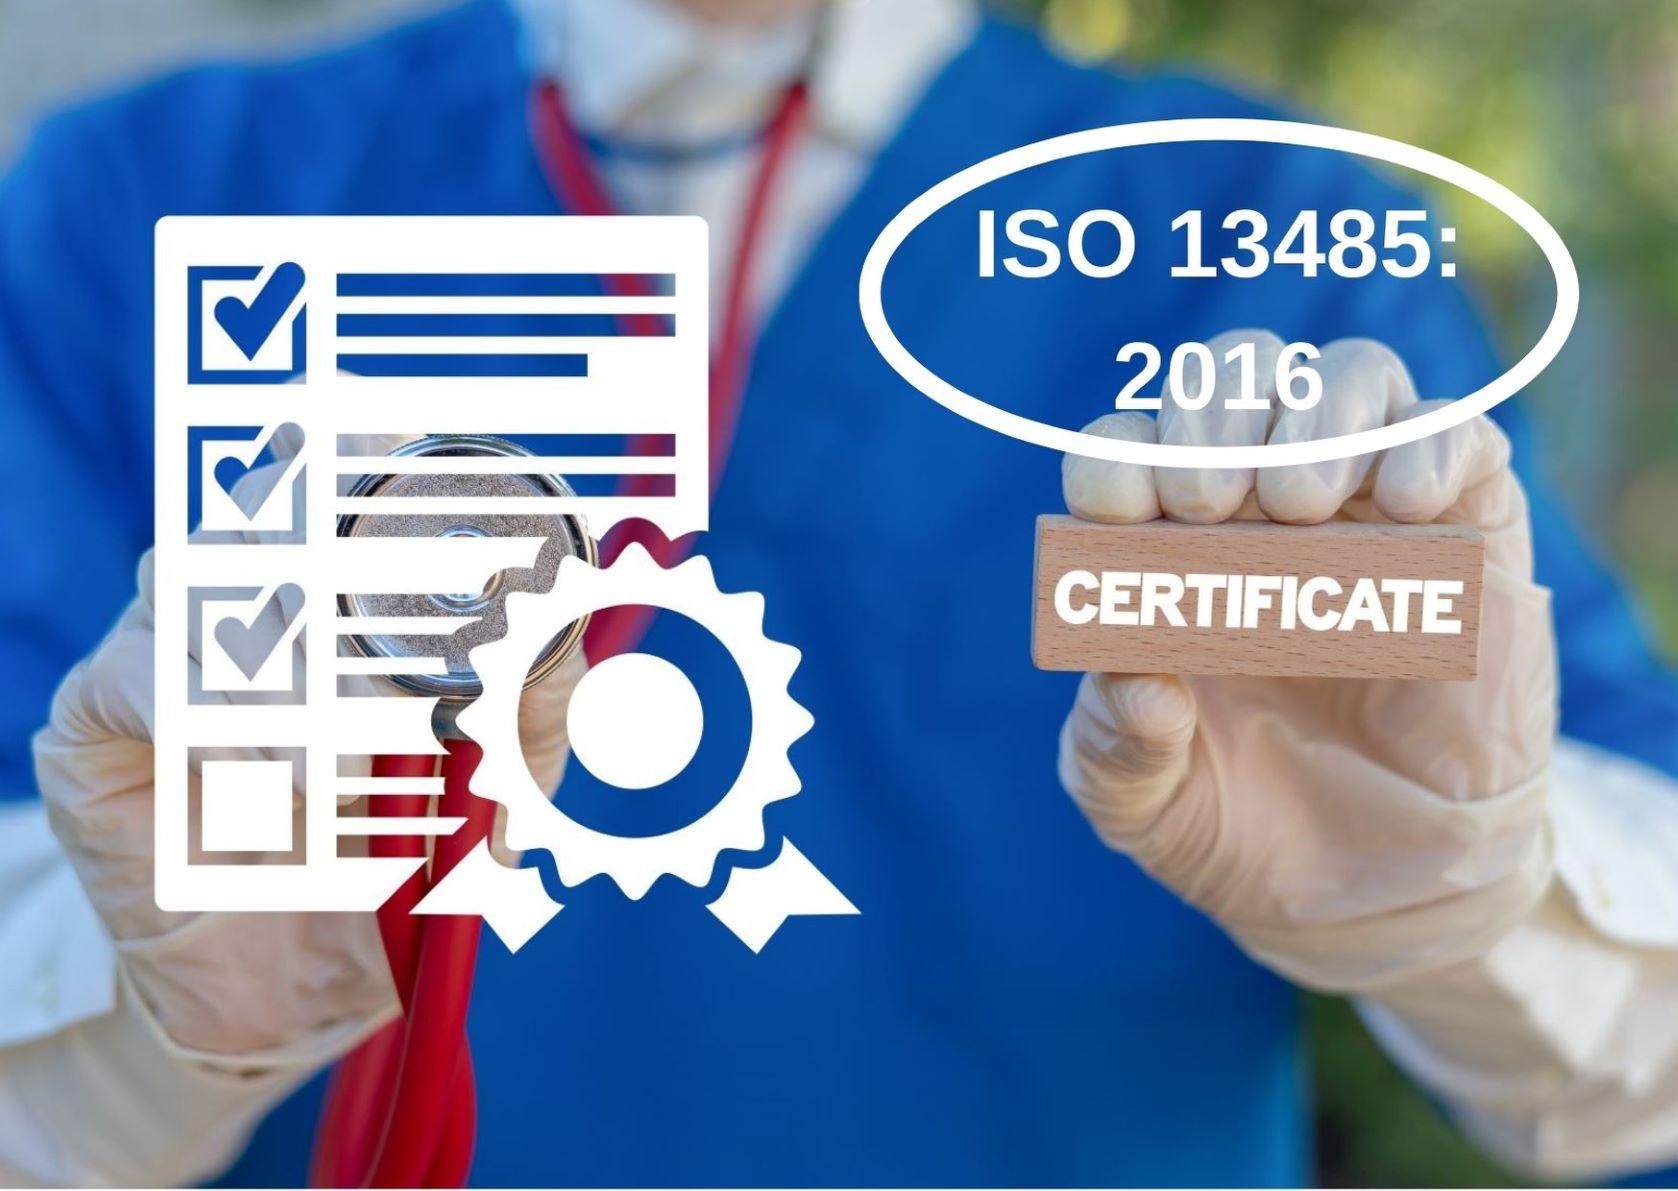 ISO 13485 certificate medium size